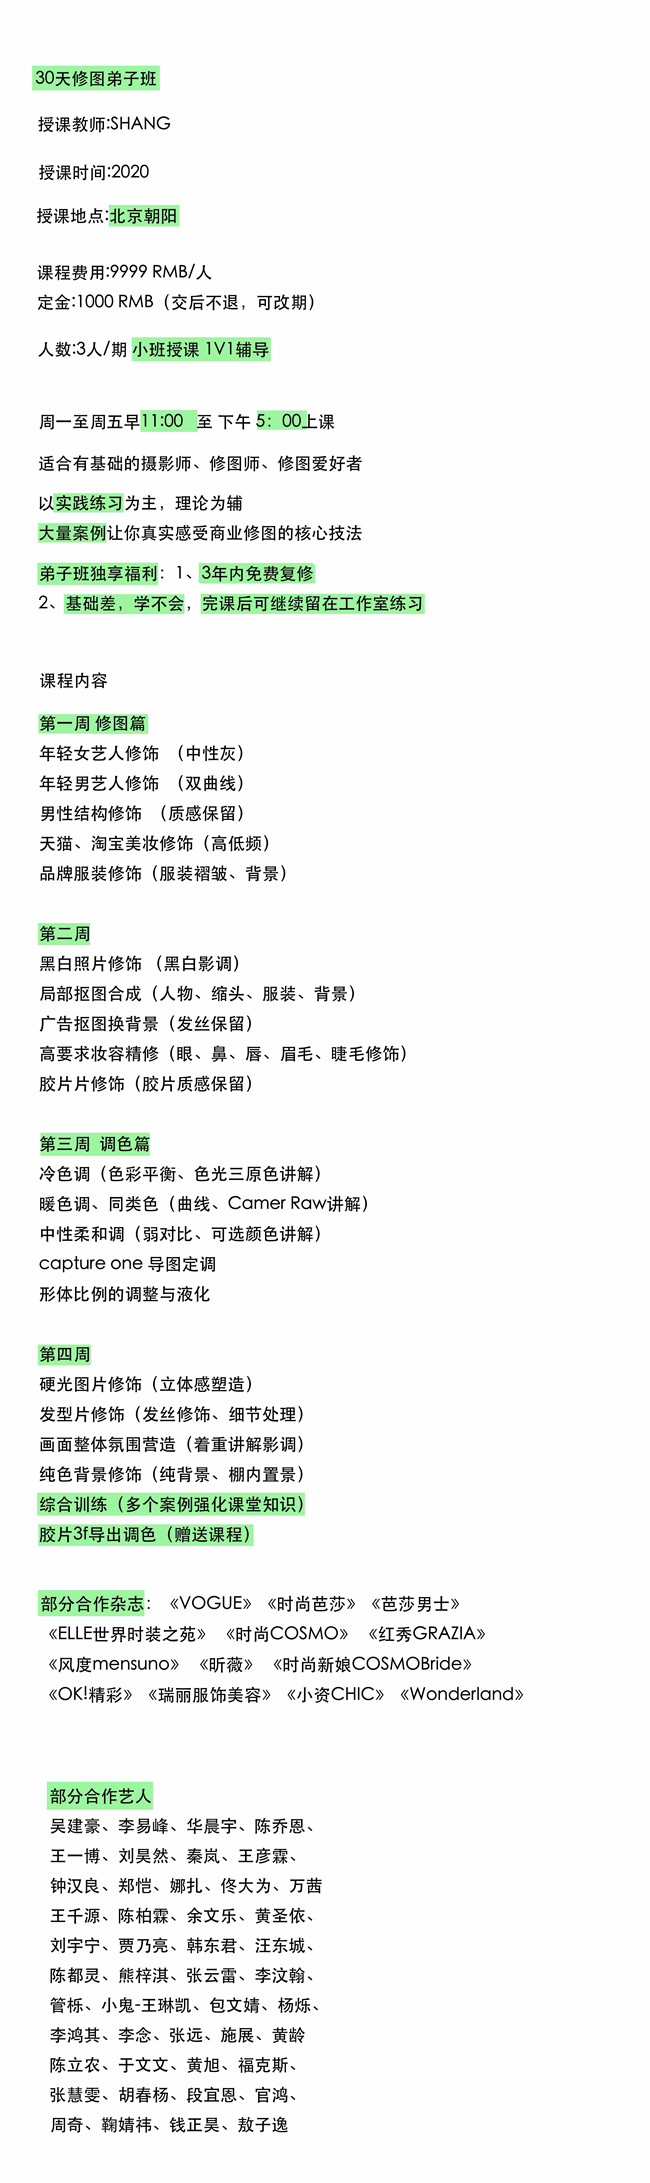 SHANG 修图30天修图弟子班报名预约(2020.10.9-2020.11.7)